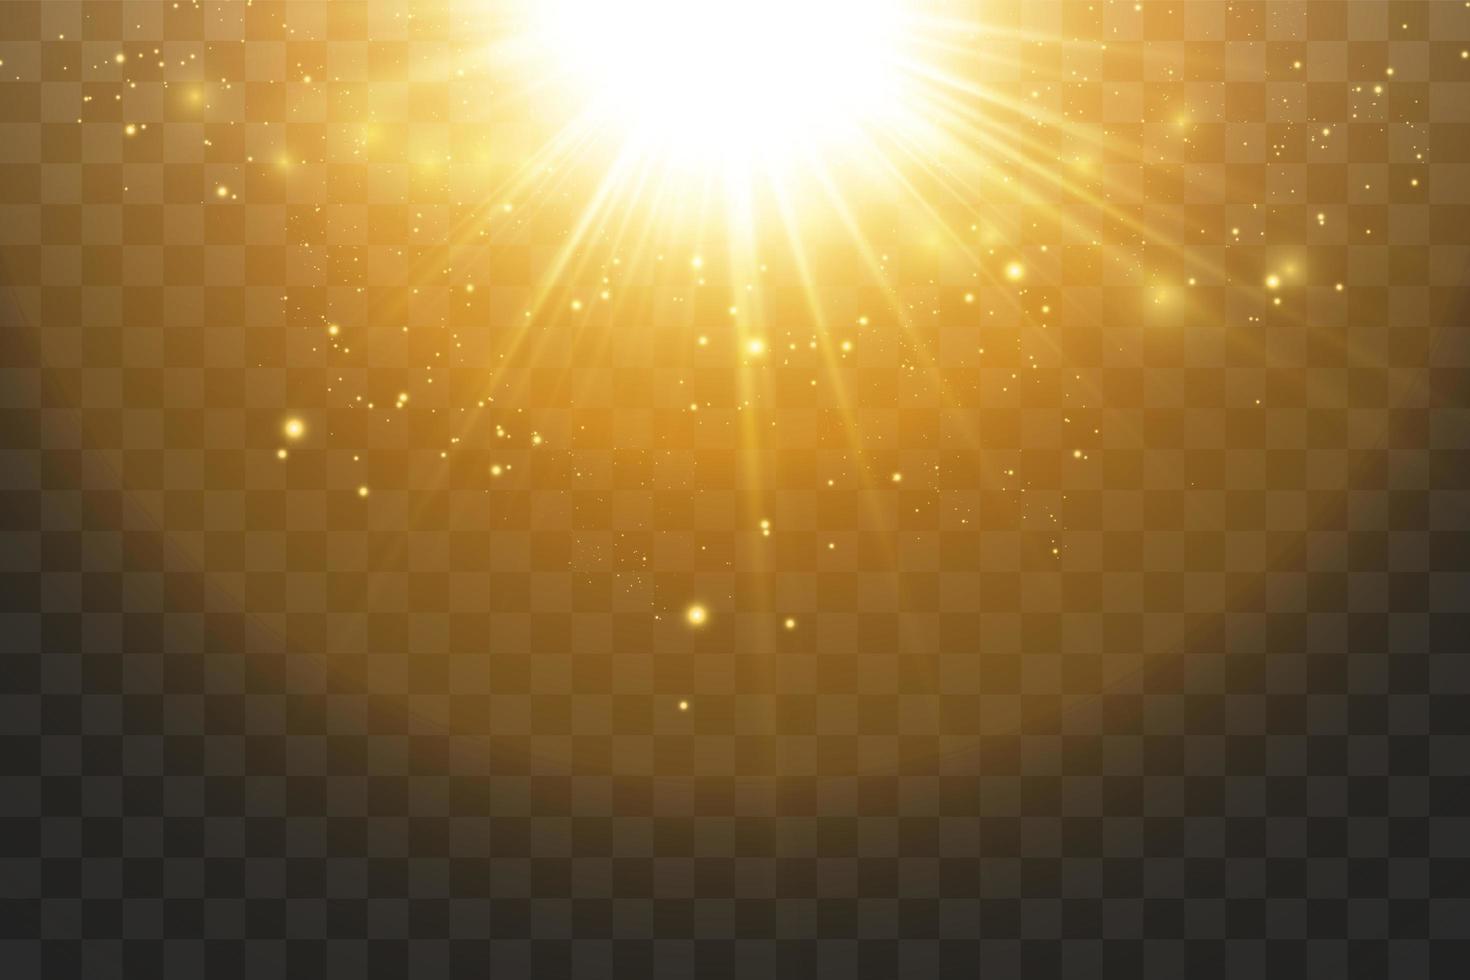 glanzende gouden sterren en lensflare vector